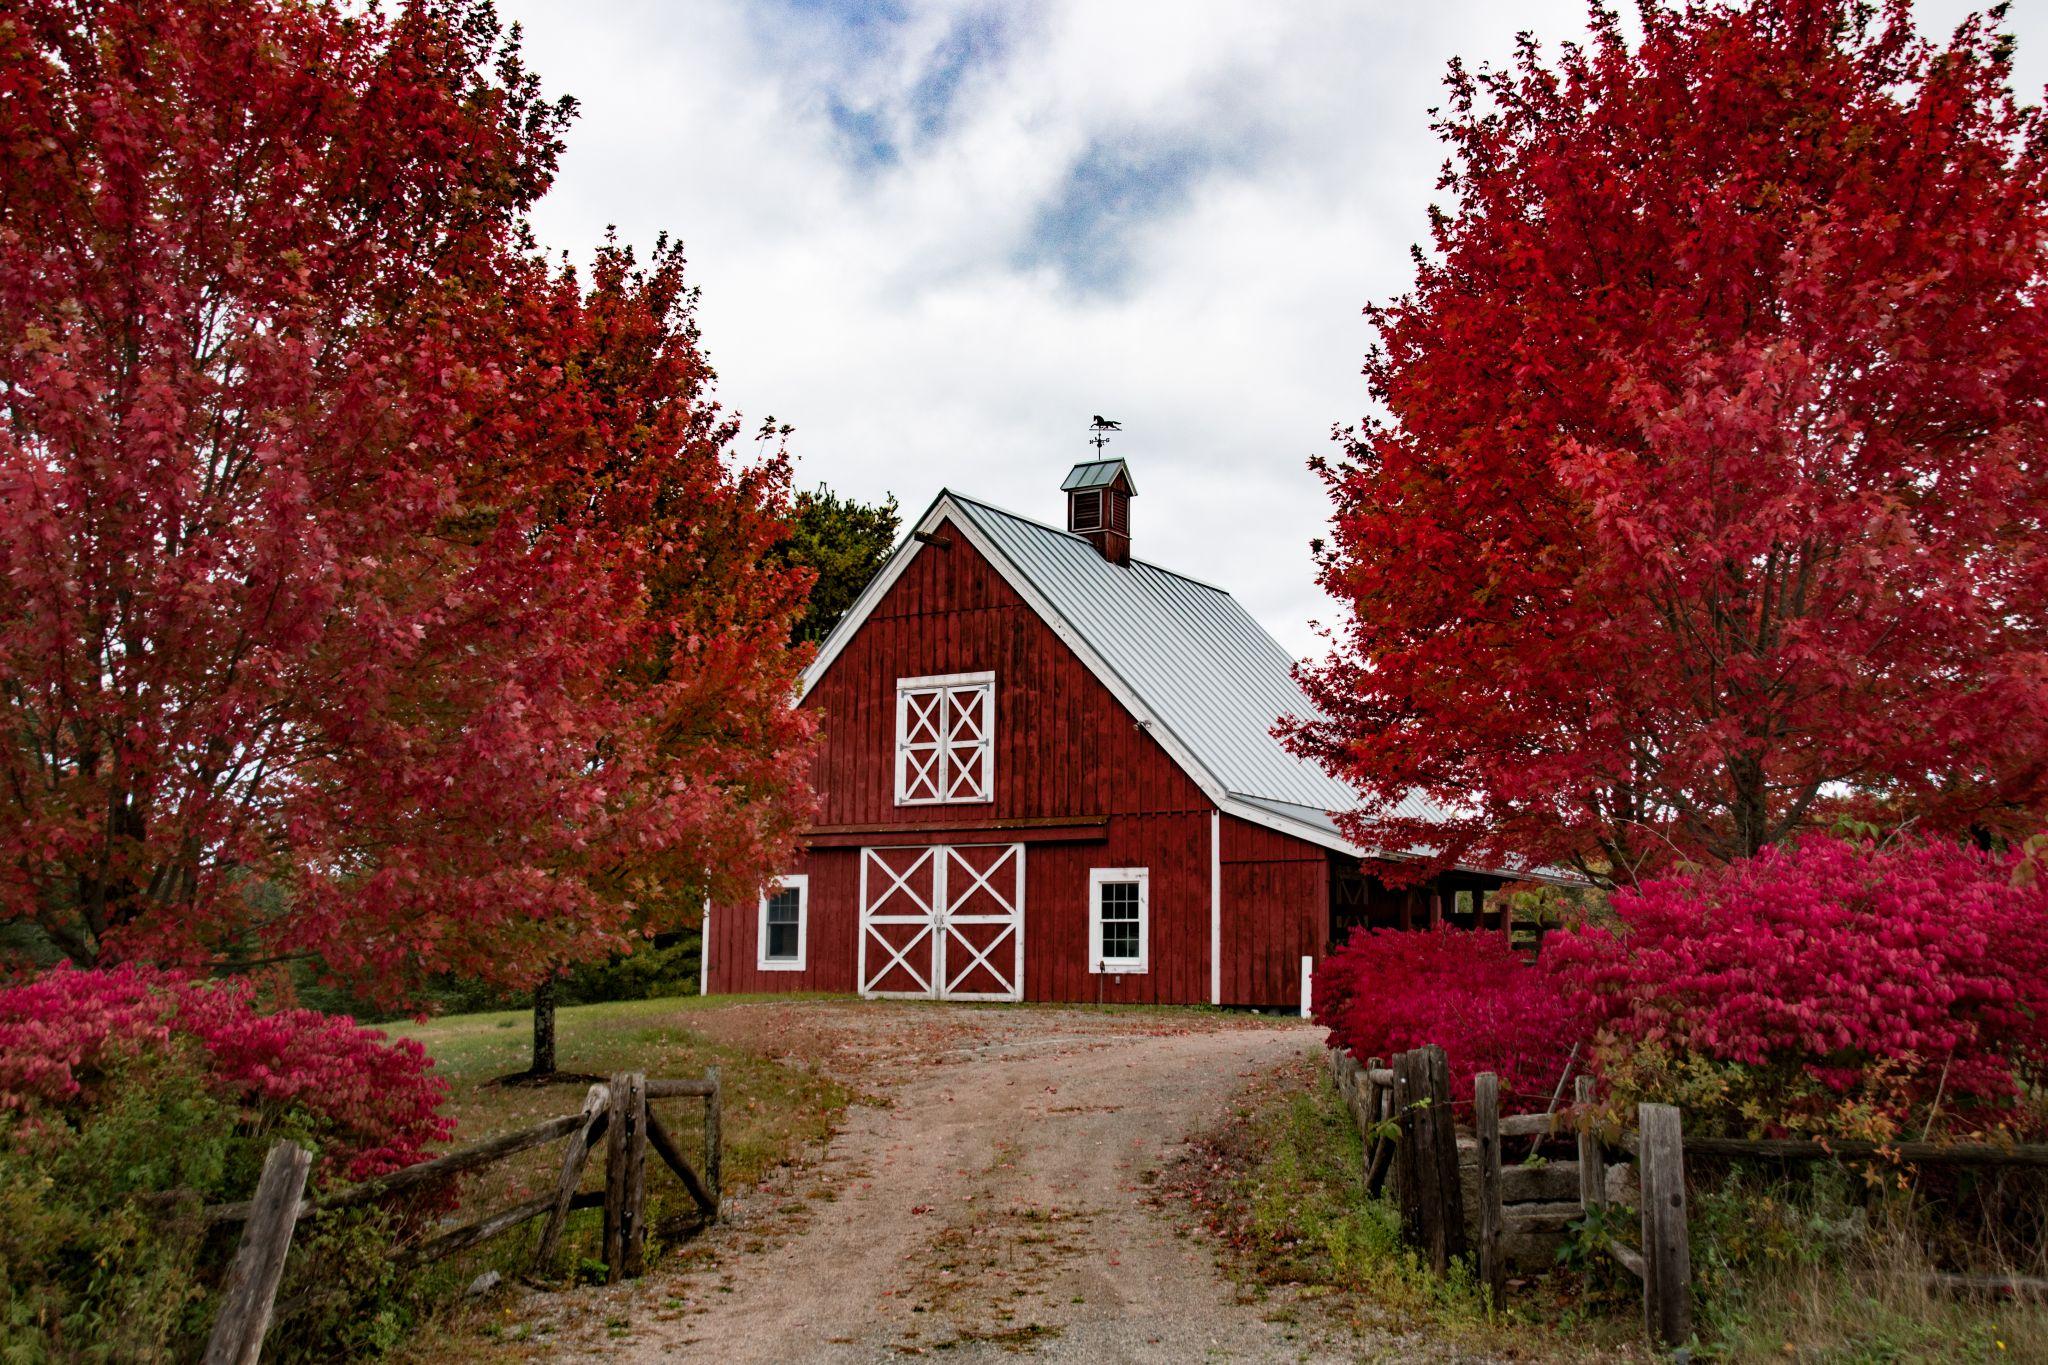 Red Barn, USA